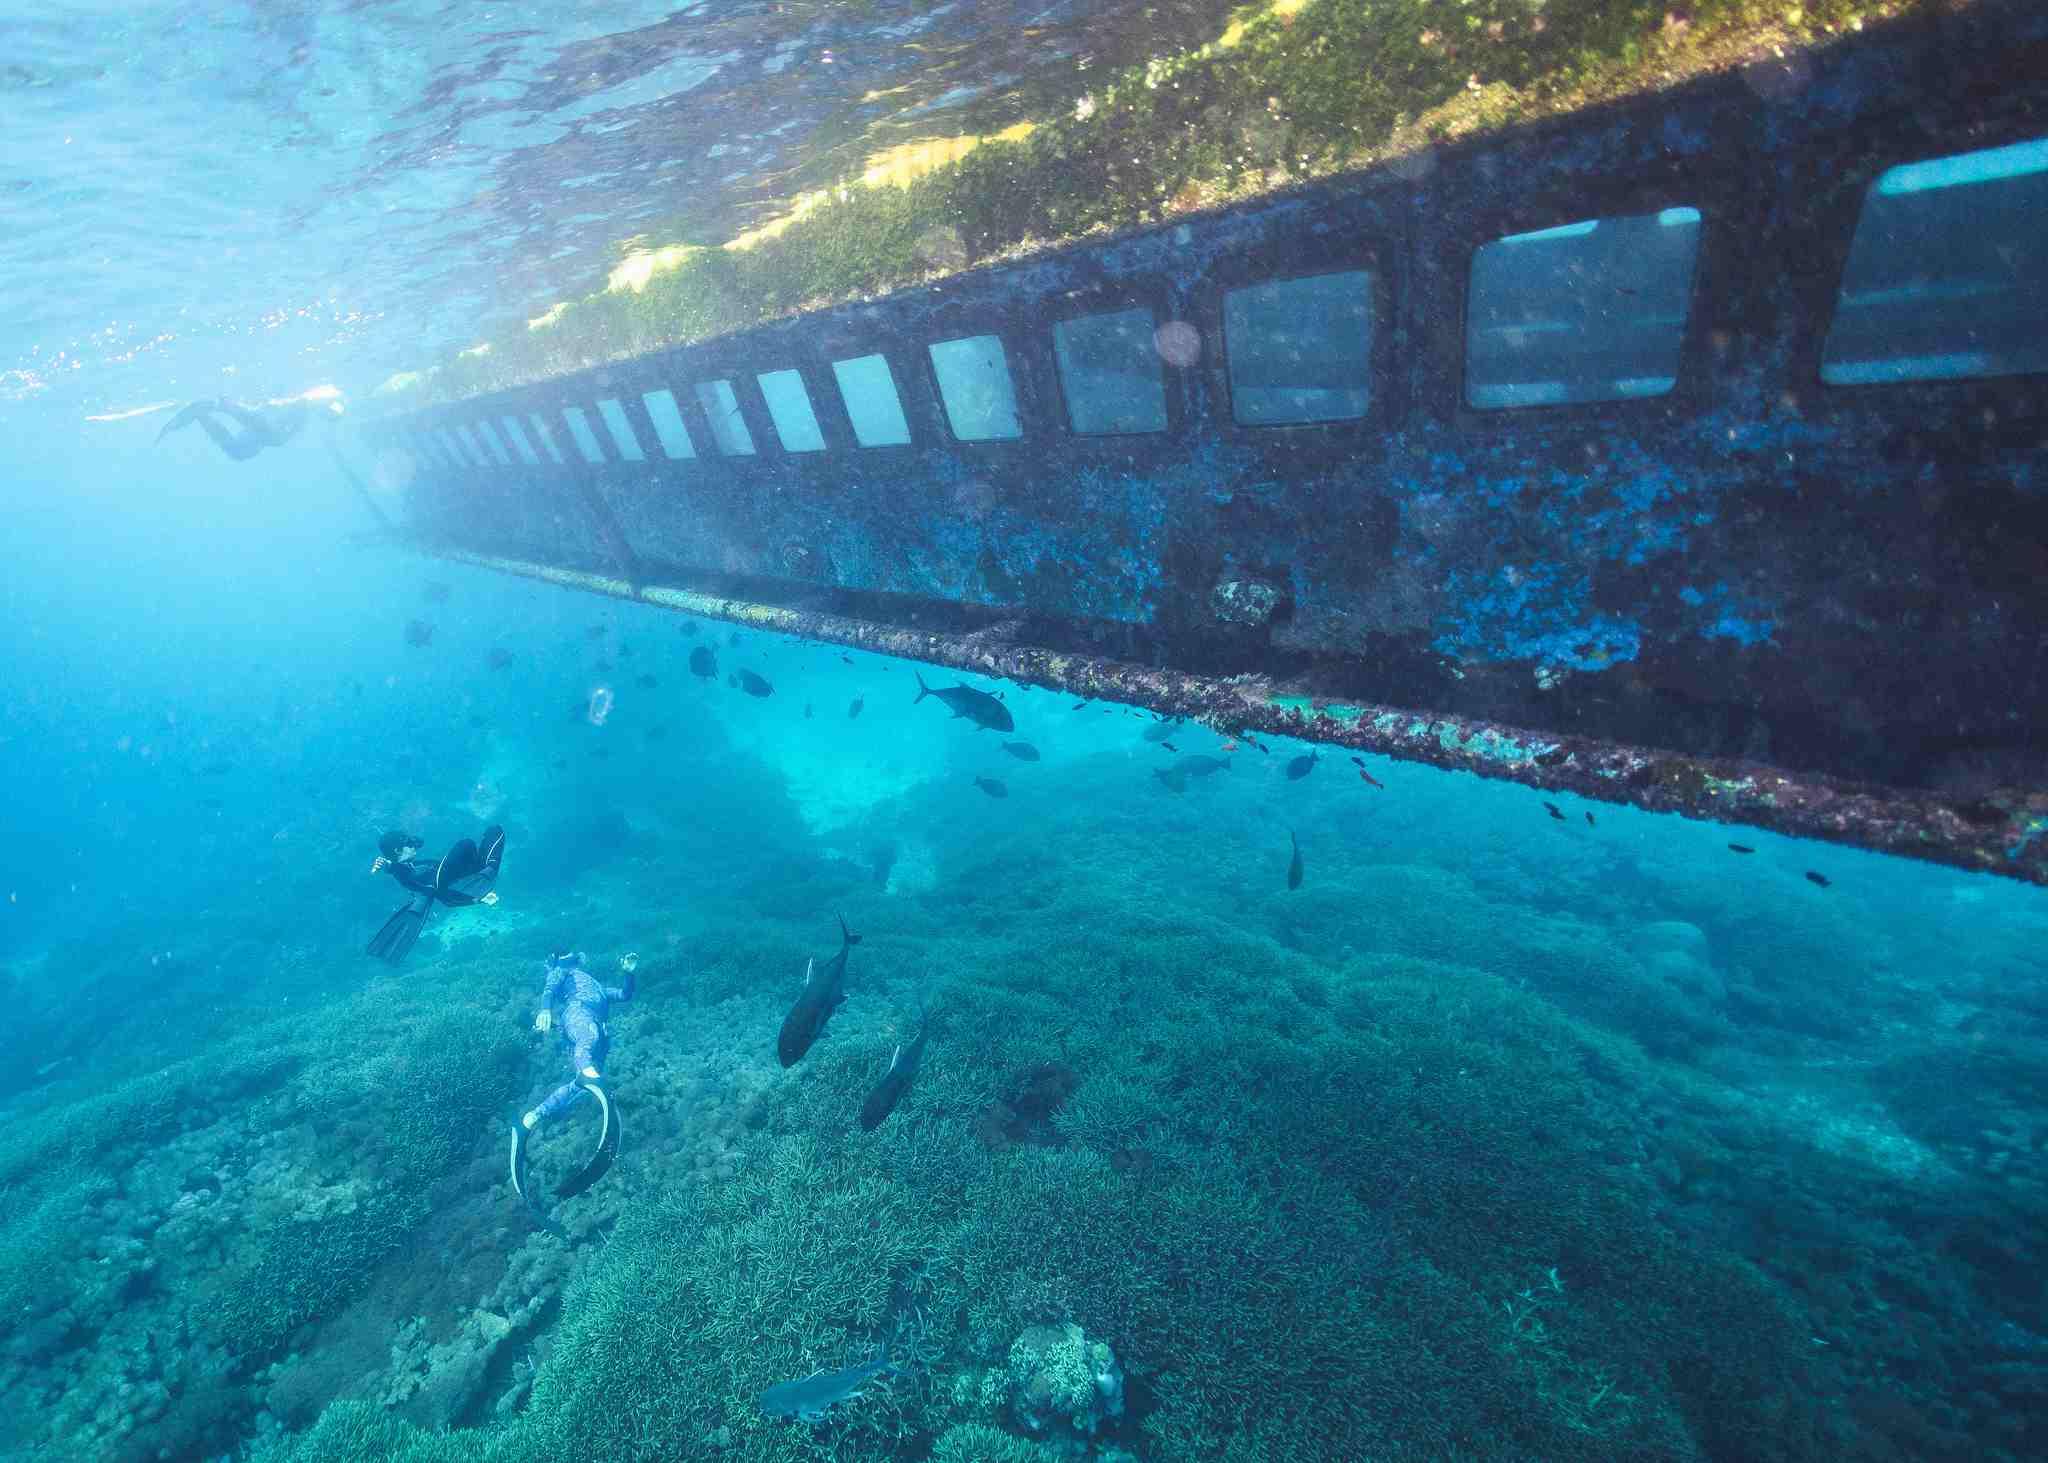 Sunken ship and free divers underwater, Nusa Penida, Bali, Indonesia